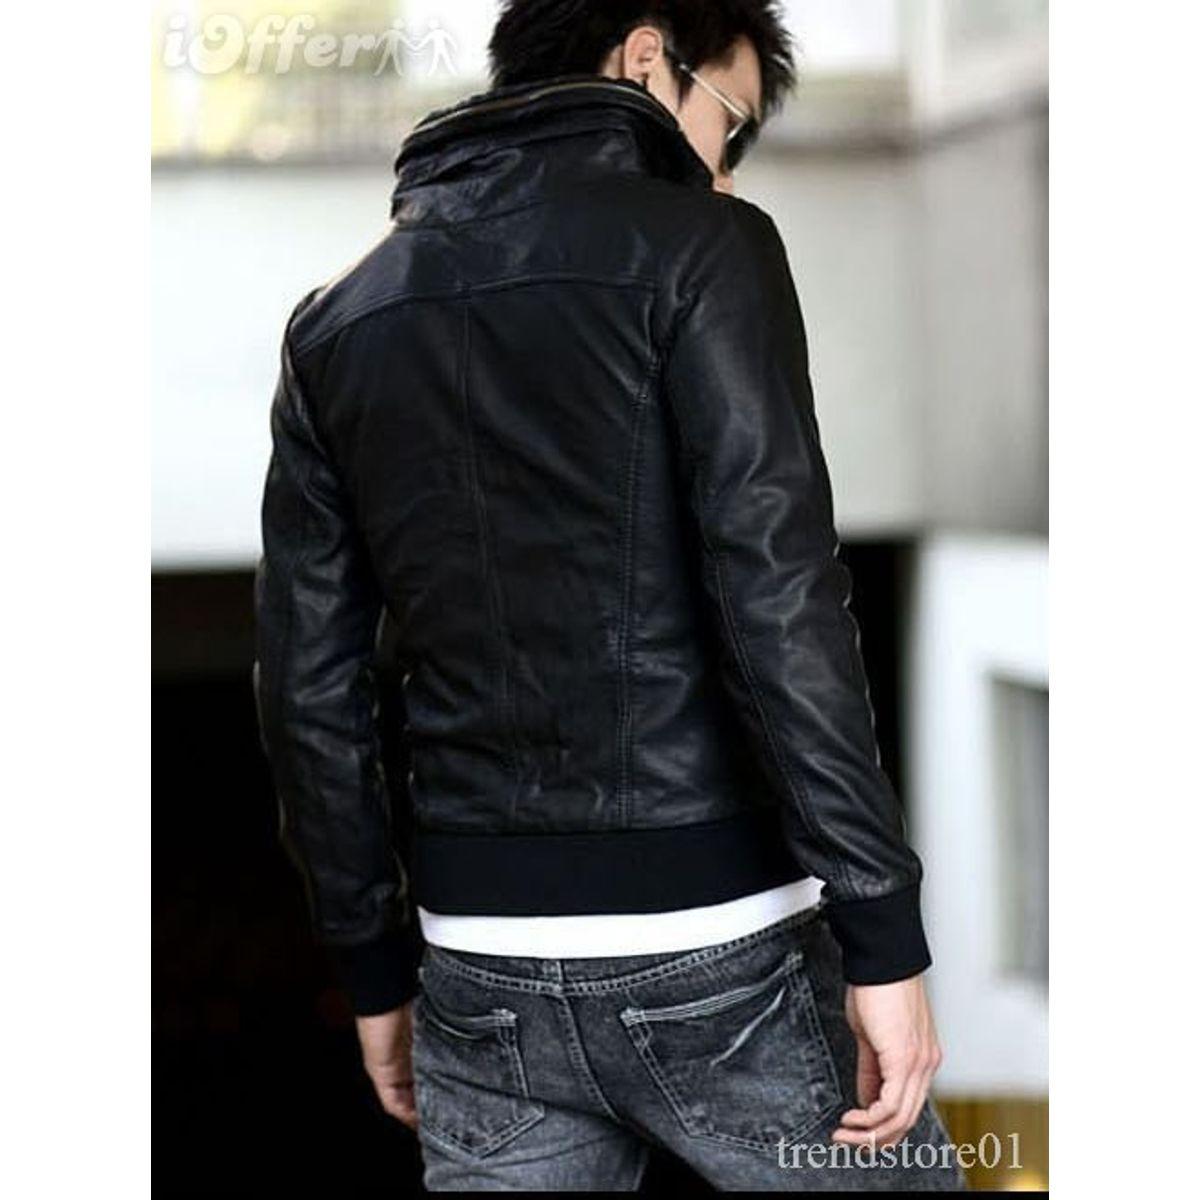 Italiano TUCCI Vintage Slim Fit Padding Style Designer Mens Semi Leather Jacket Black P11